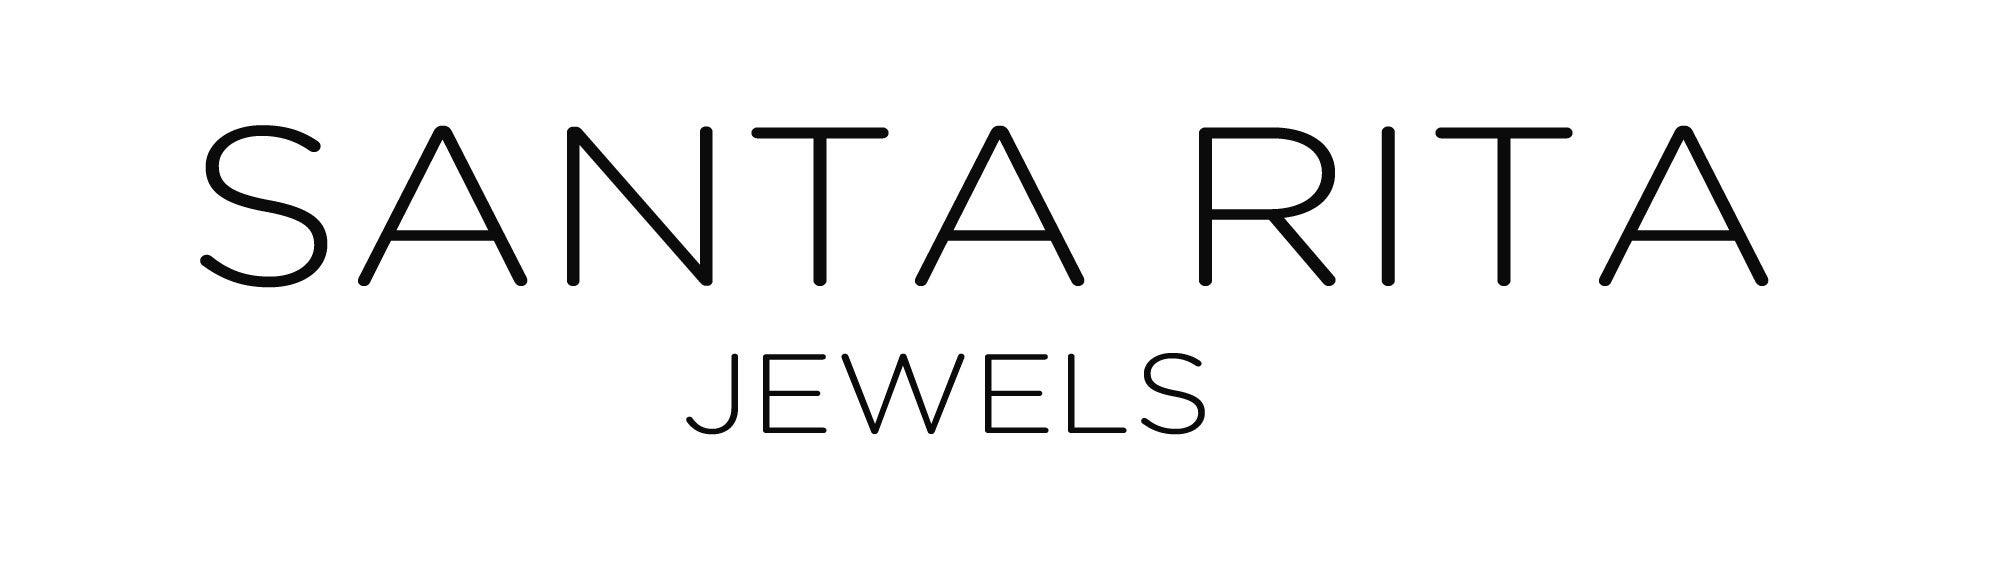 Santa Rita Jewels